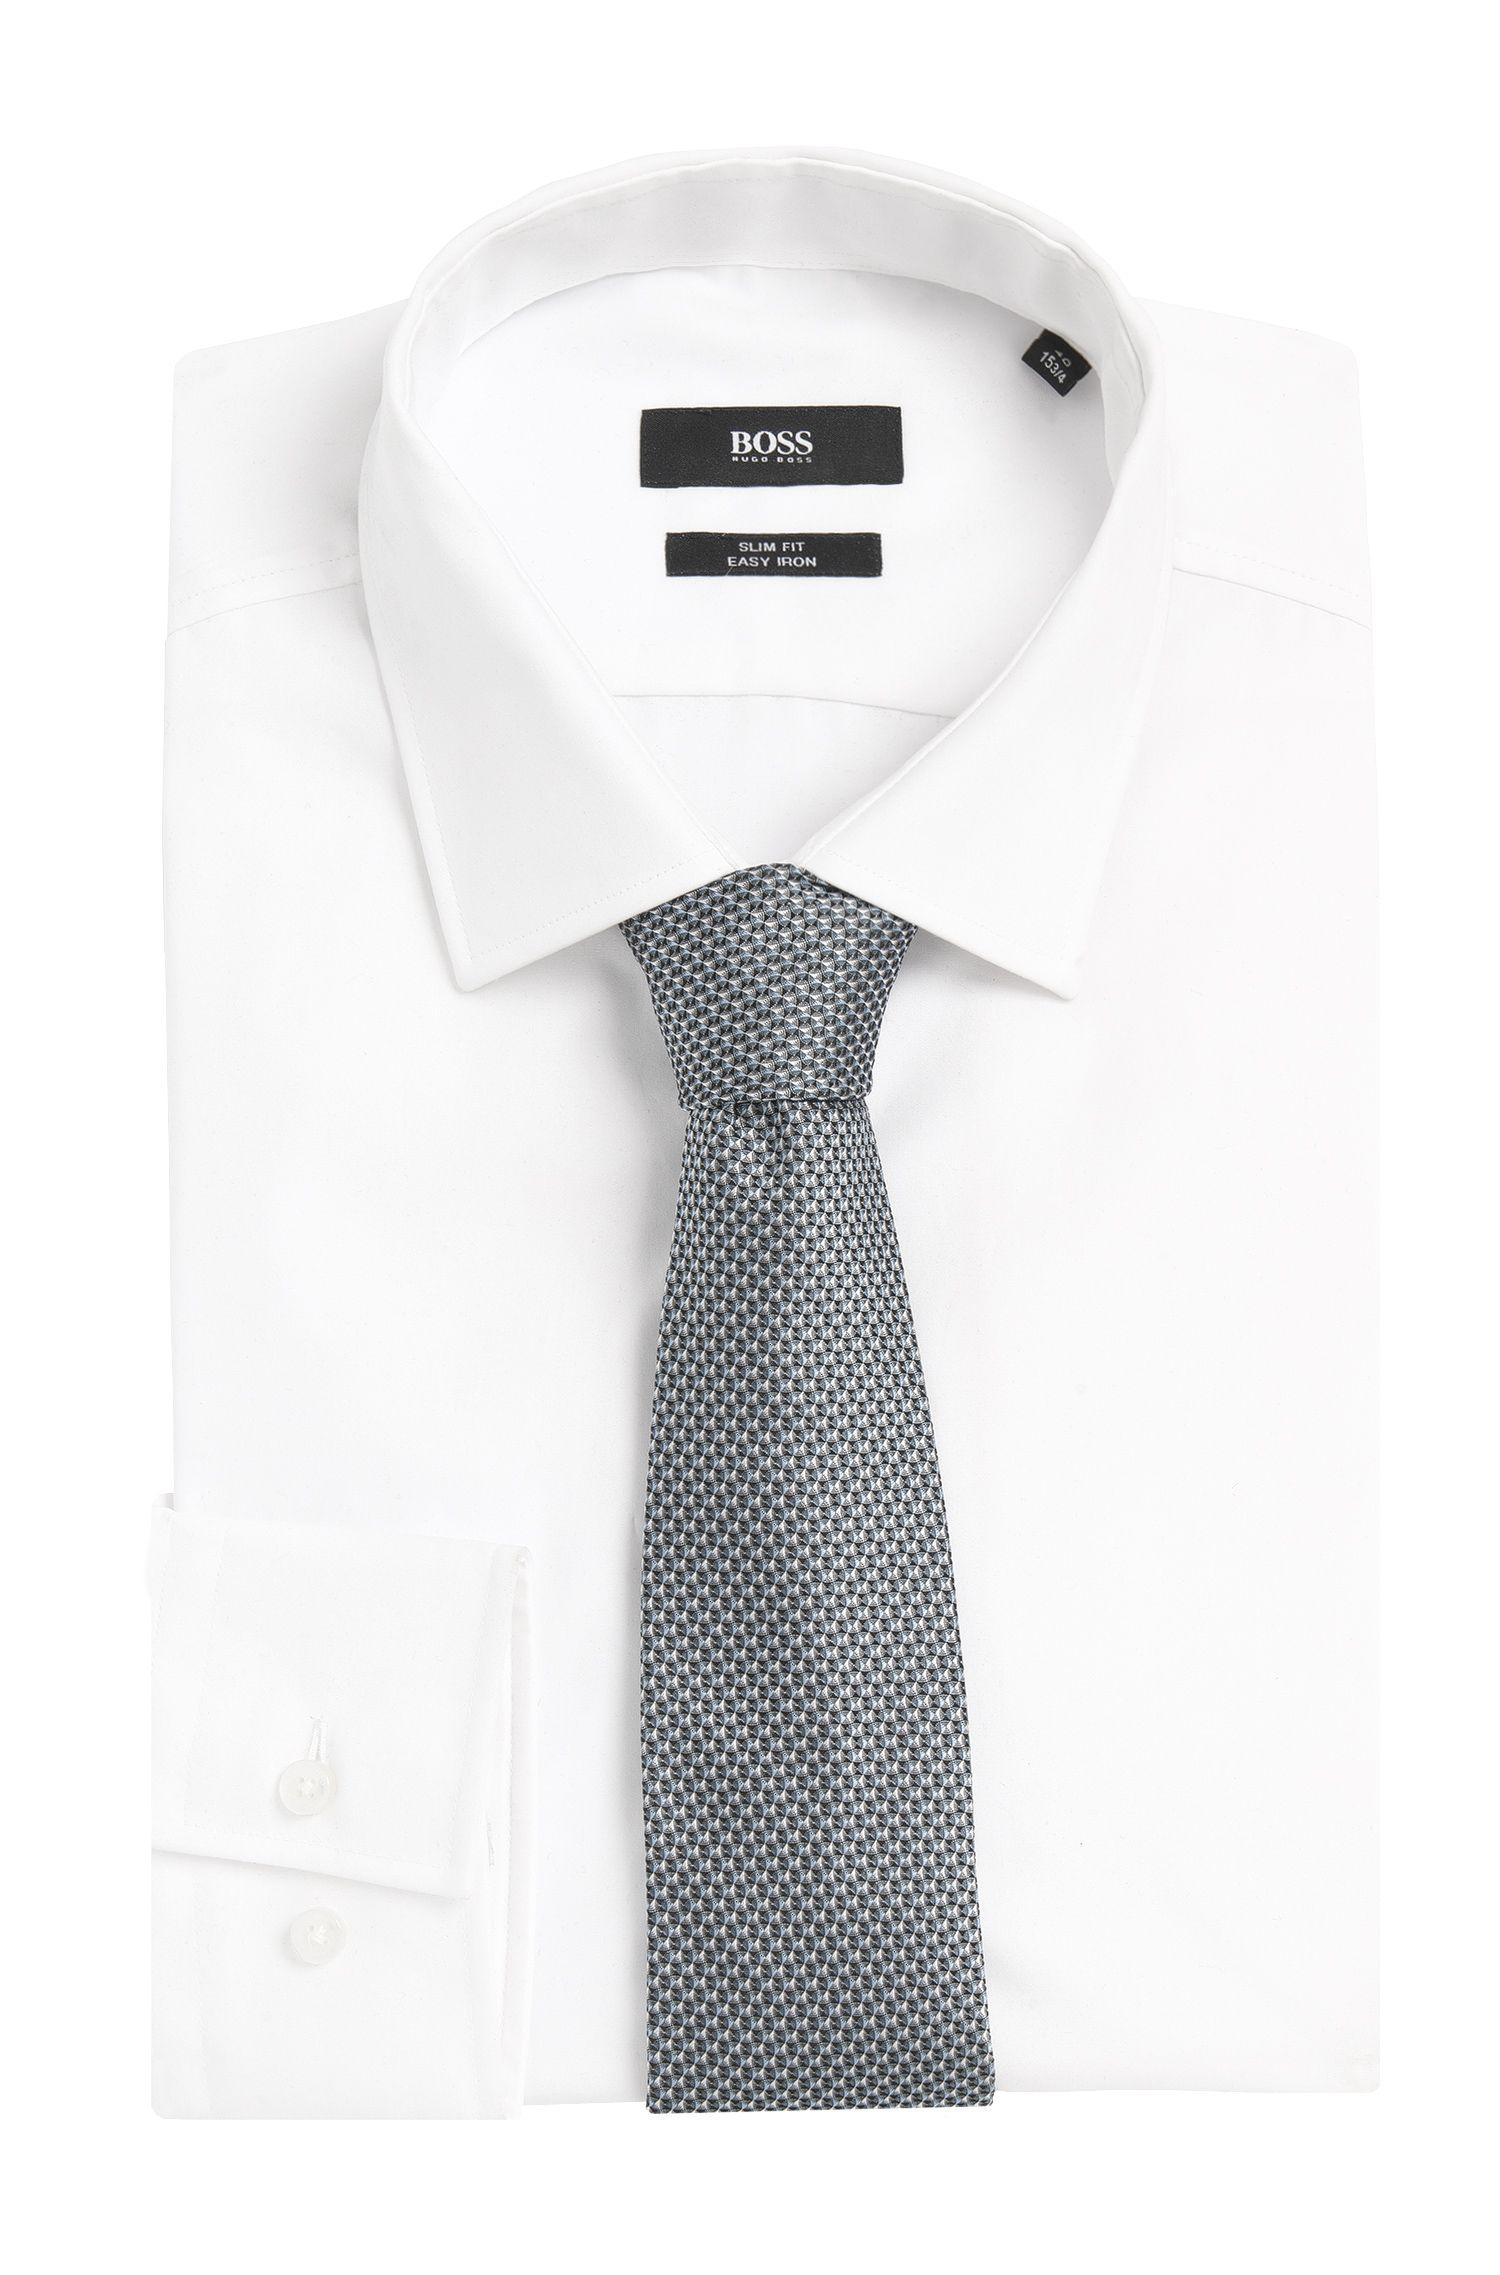 'Tie 7.5 cm' | Regular, Silk Geo Patterned Tie